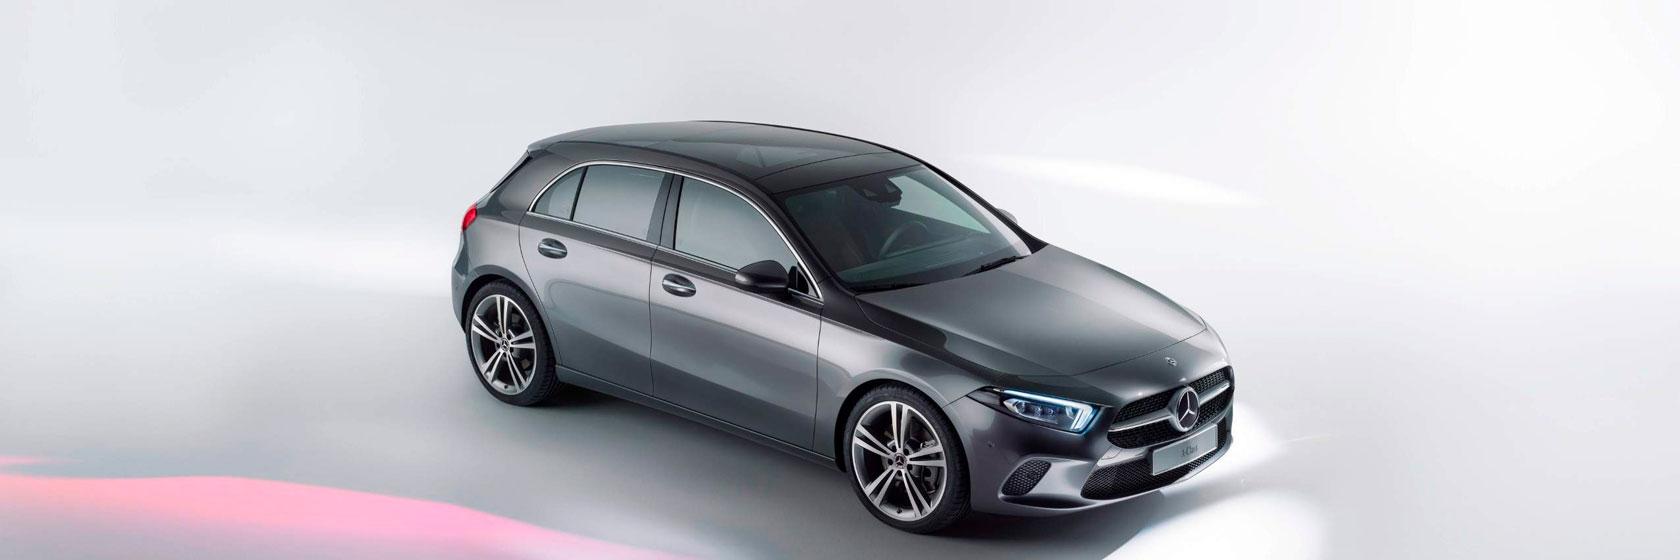 ТехнологииMercedes-Benz A-ClassHetchbek